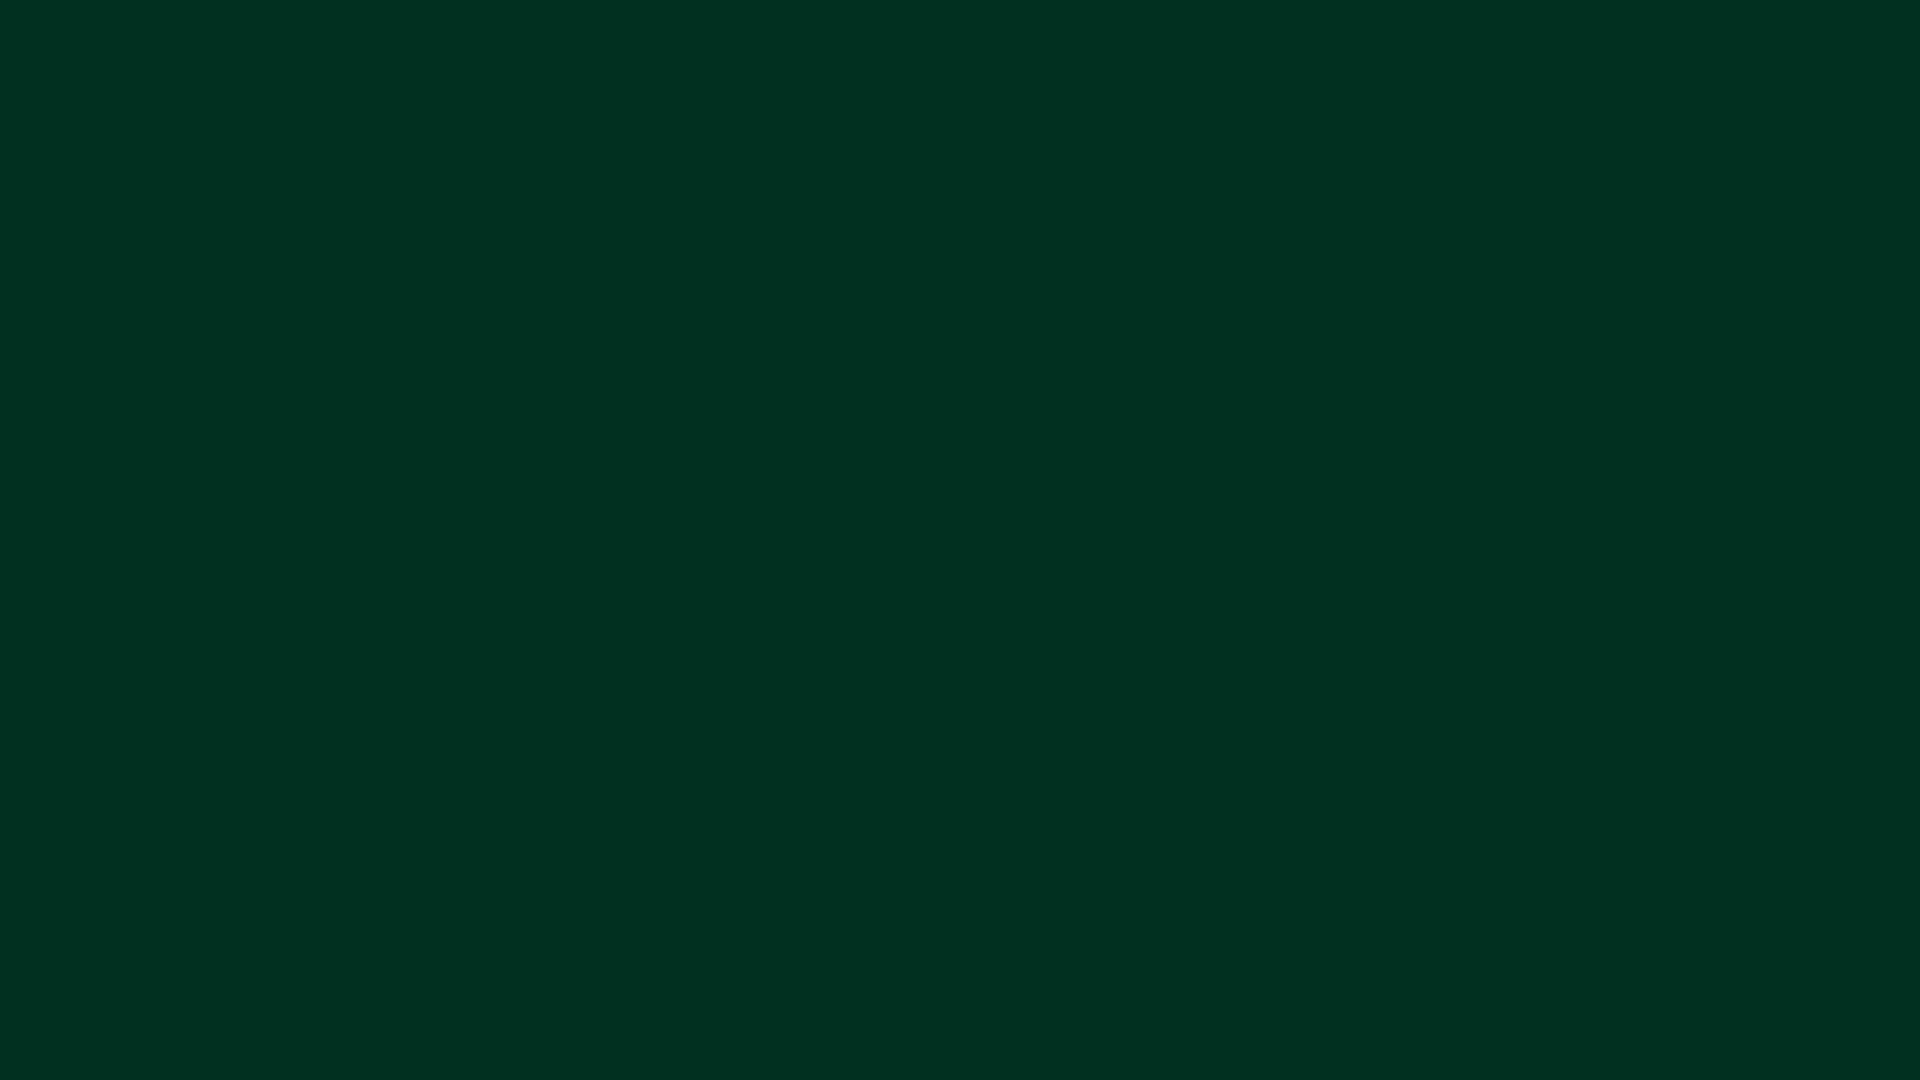 resolution dark moss green - photo #11